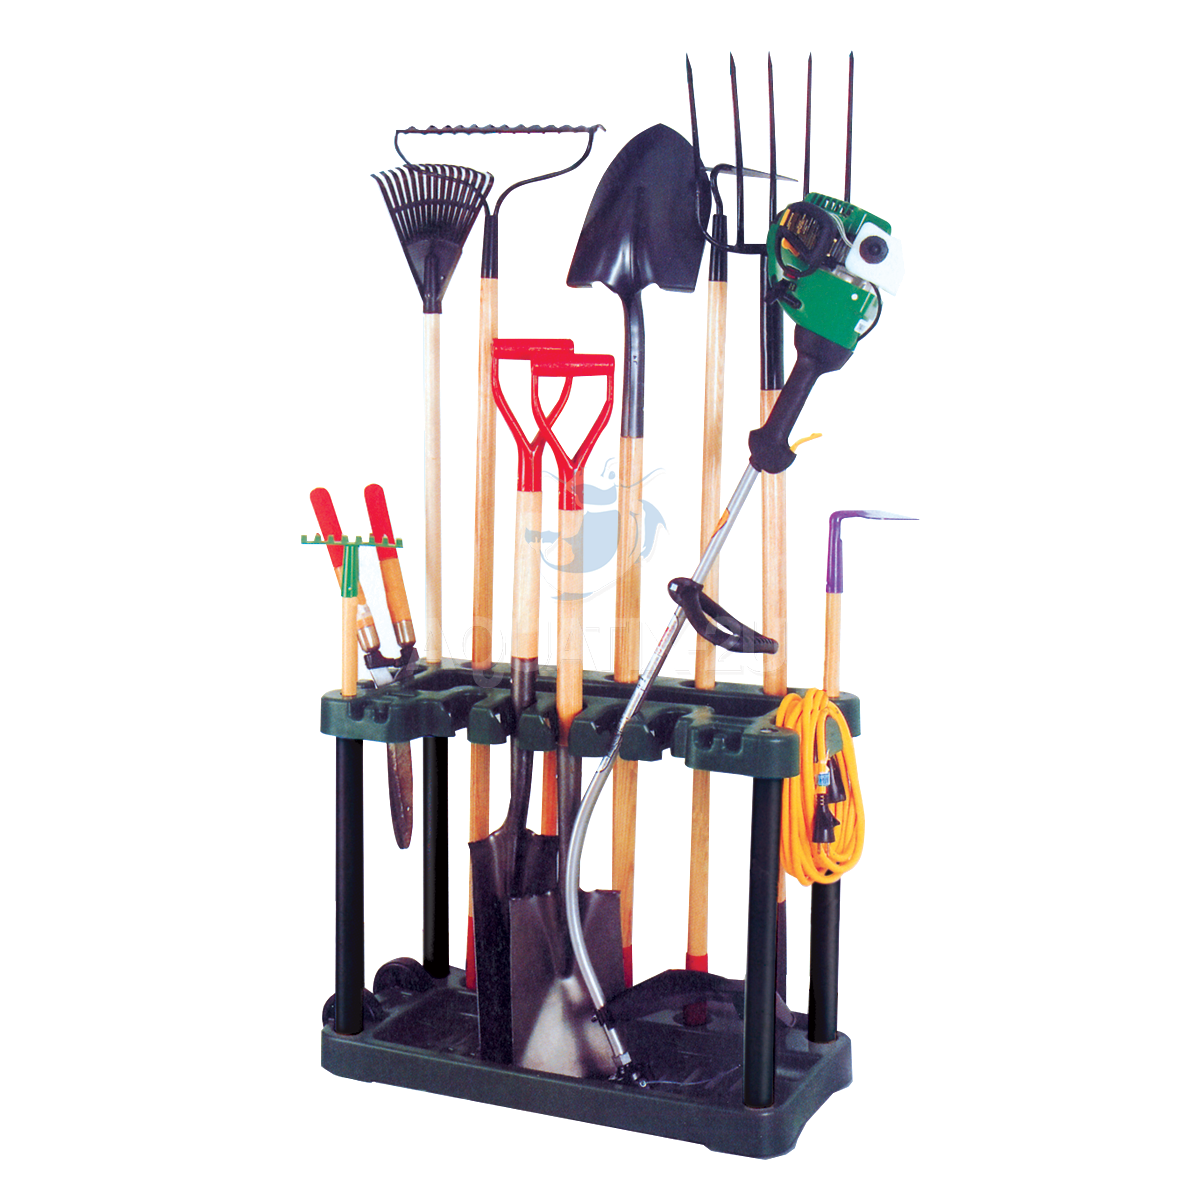 Garden Tool Rack Trolley Gardening Equipment Storage Caddy